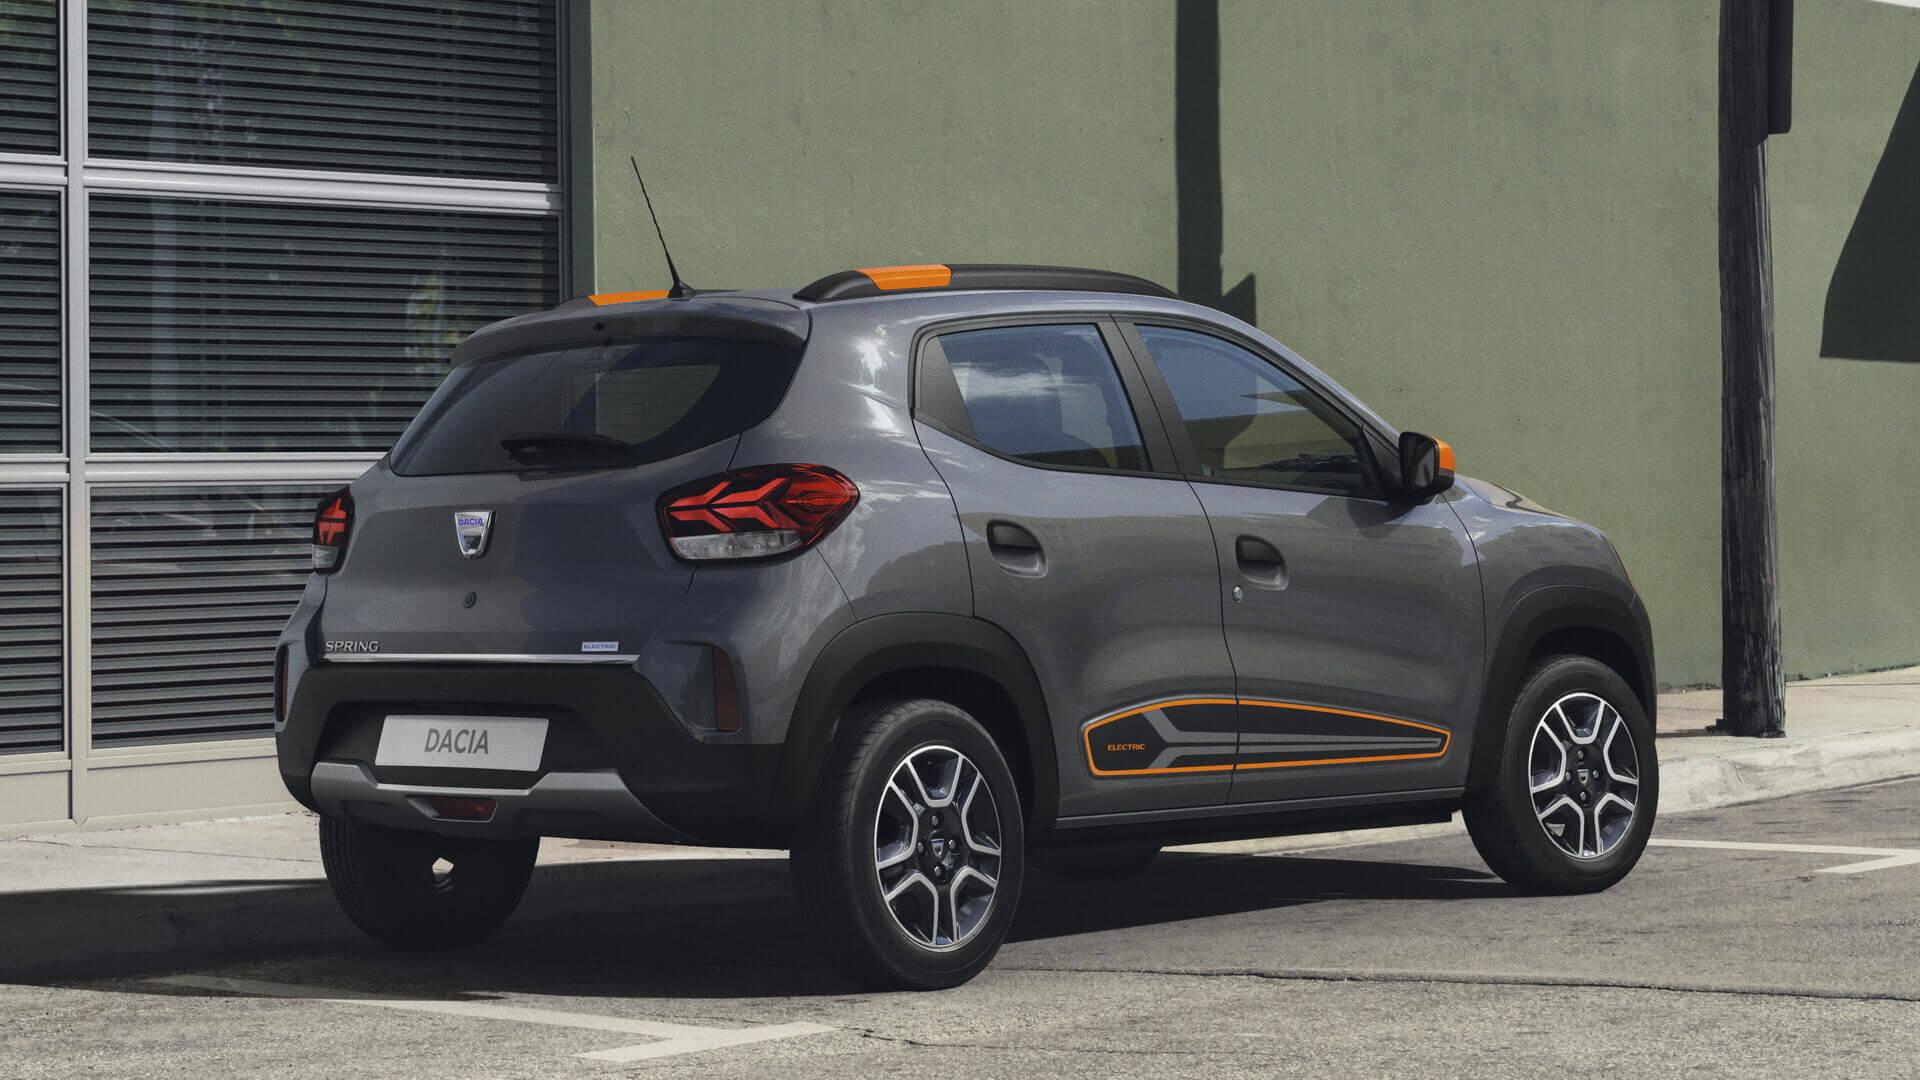 Dacia Spring Electric обеспечивает запас хода в 225 км